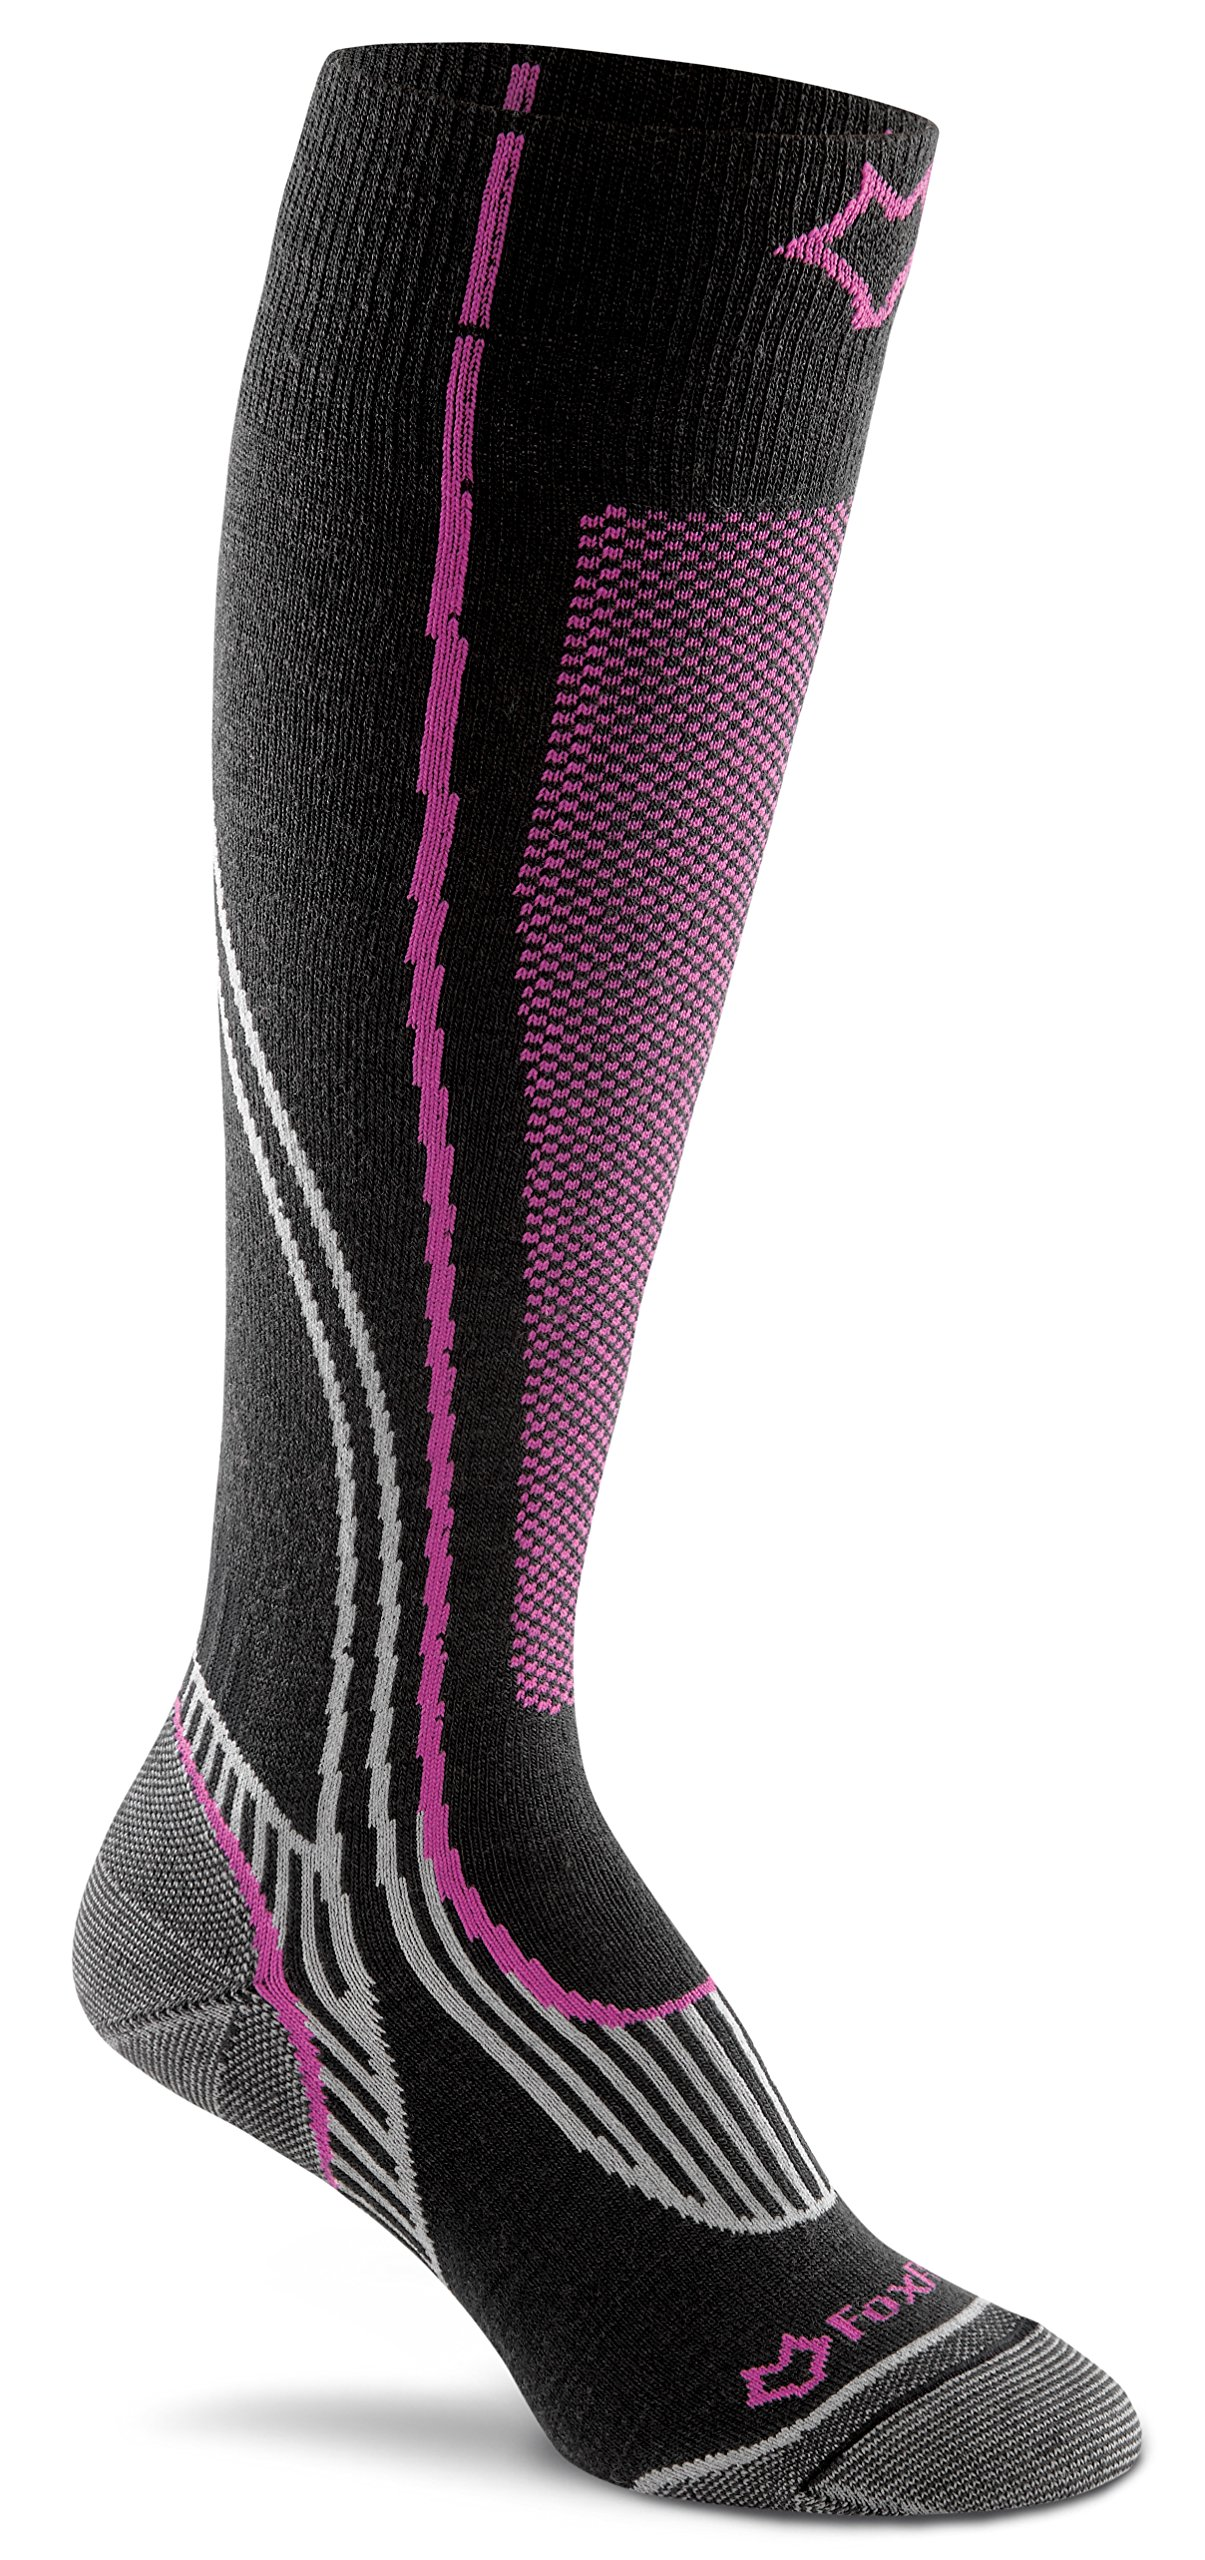 FoxRiver Sugarloaf Ultra Lt Wt Over-the-calf skiing-socks